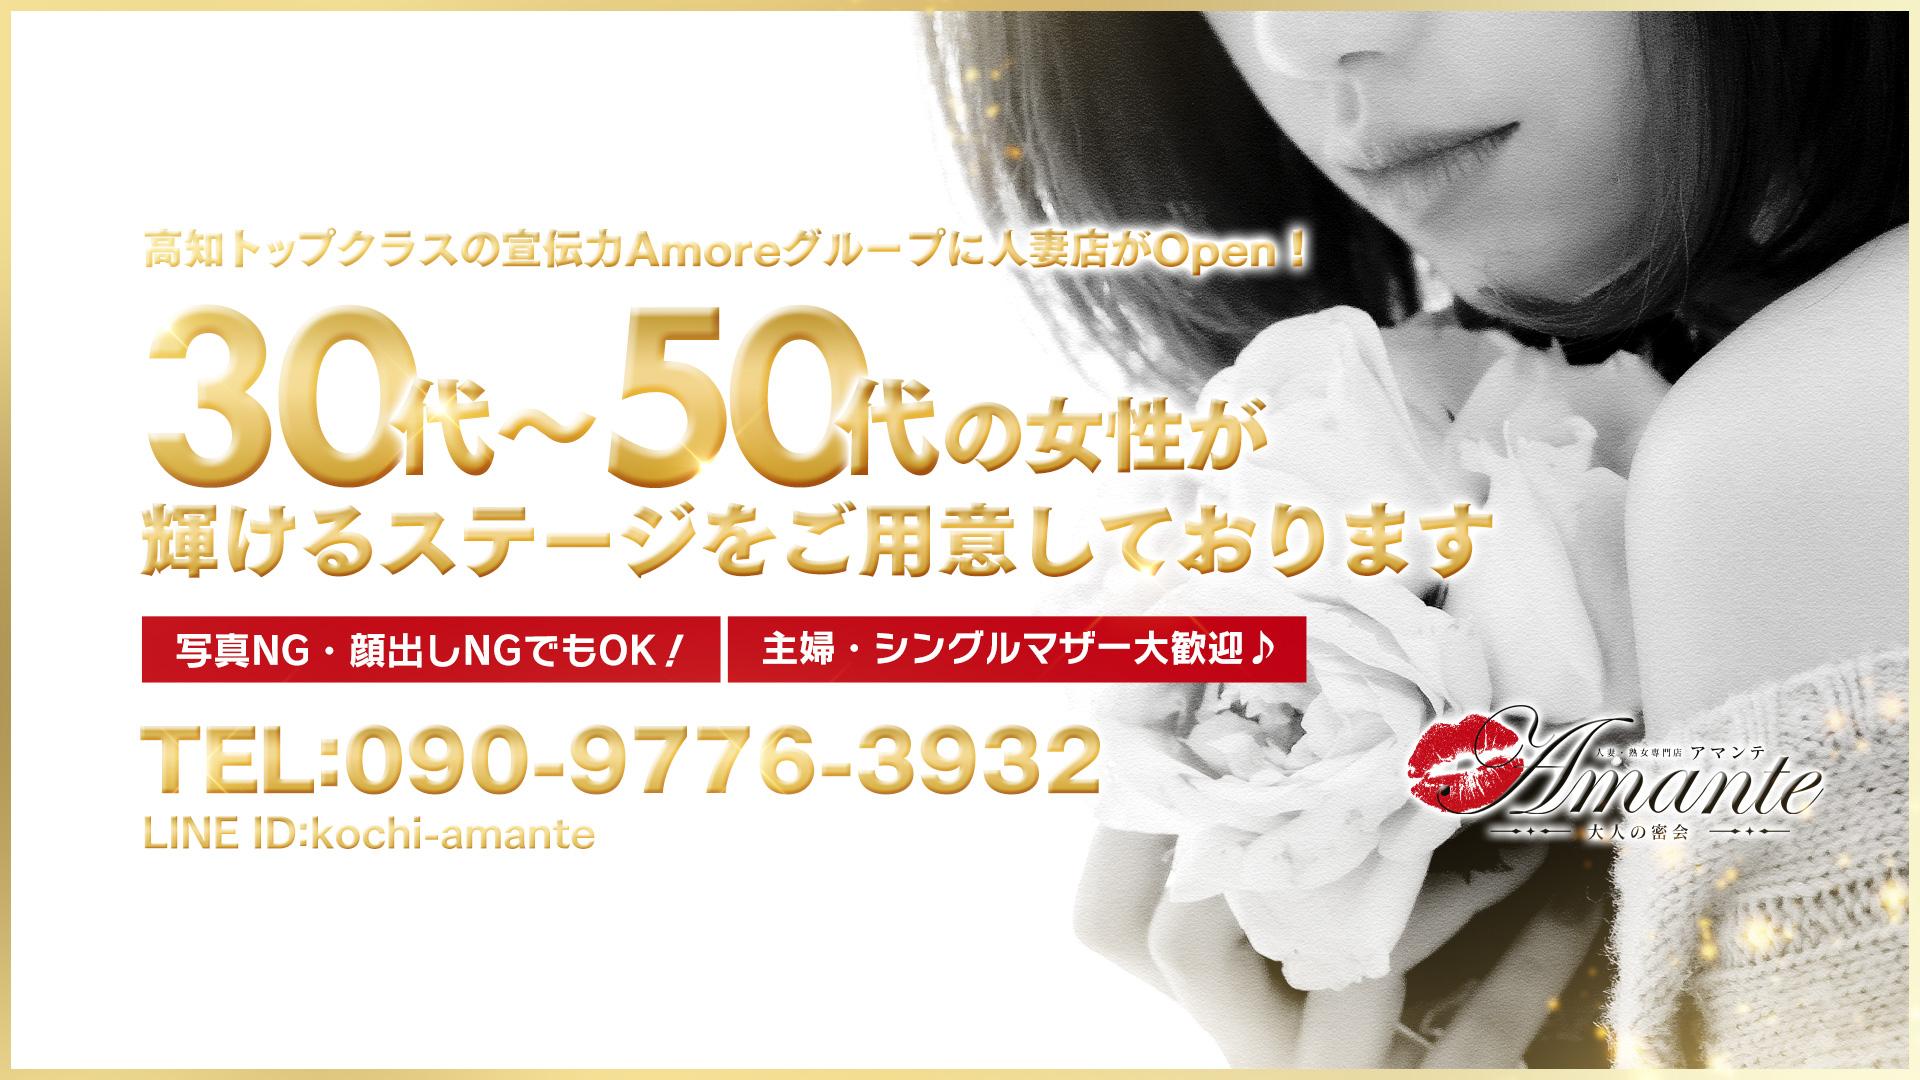 Amante(アマンテ)~大人の密会~(高知市近郊)のデリヘル求人・高収入バイトPR画像1